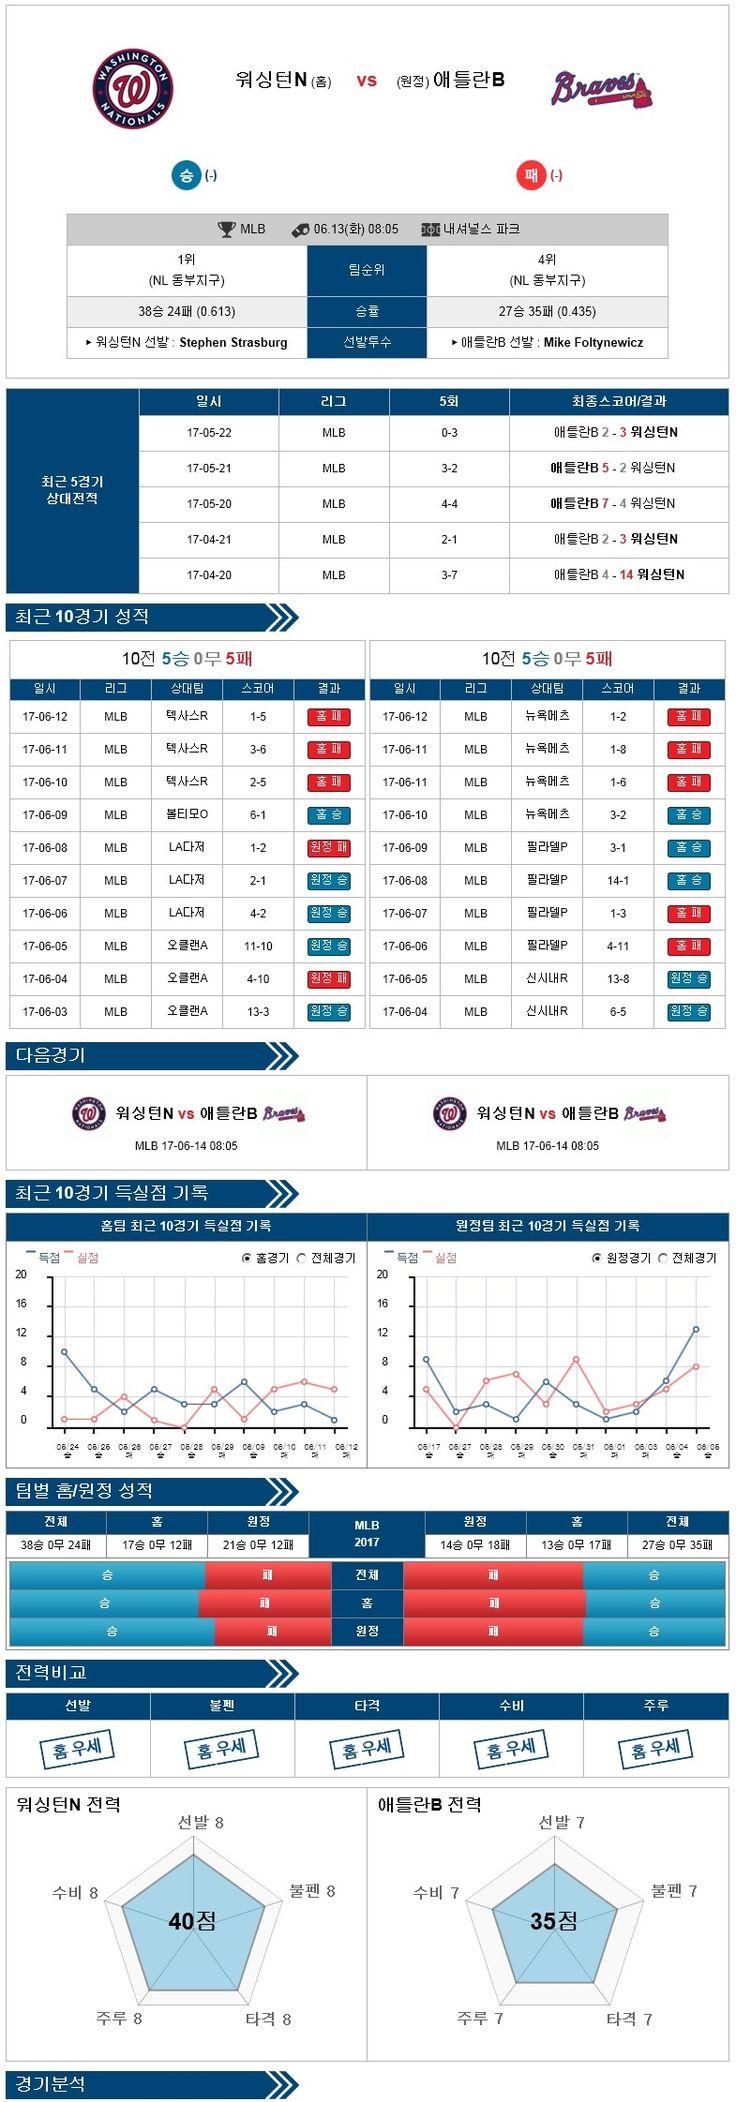 [MLB] 6월 13일 야구분석픽 워싱턴 vs 애틀랜타 ★토토군 분석픽★